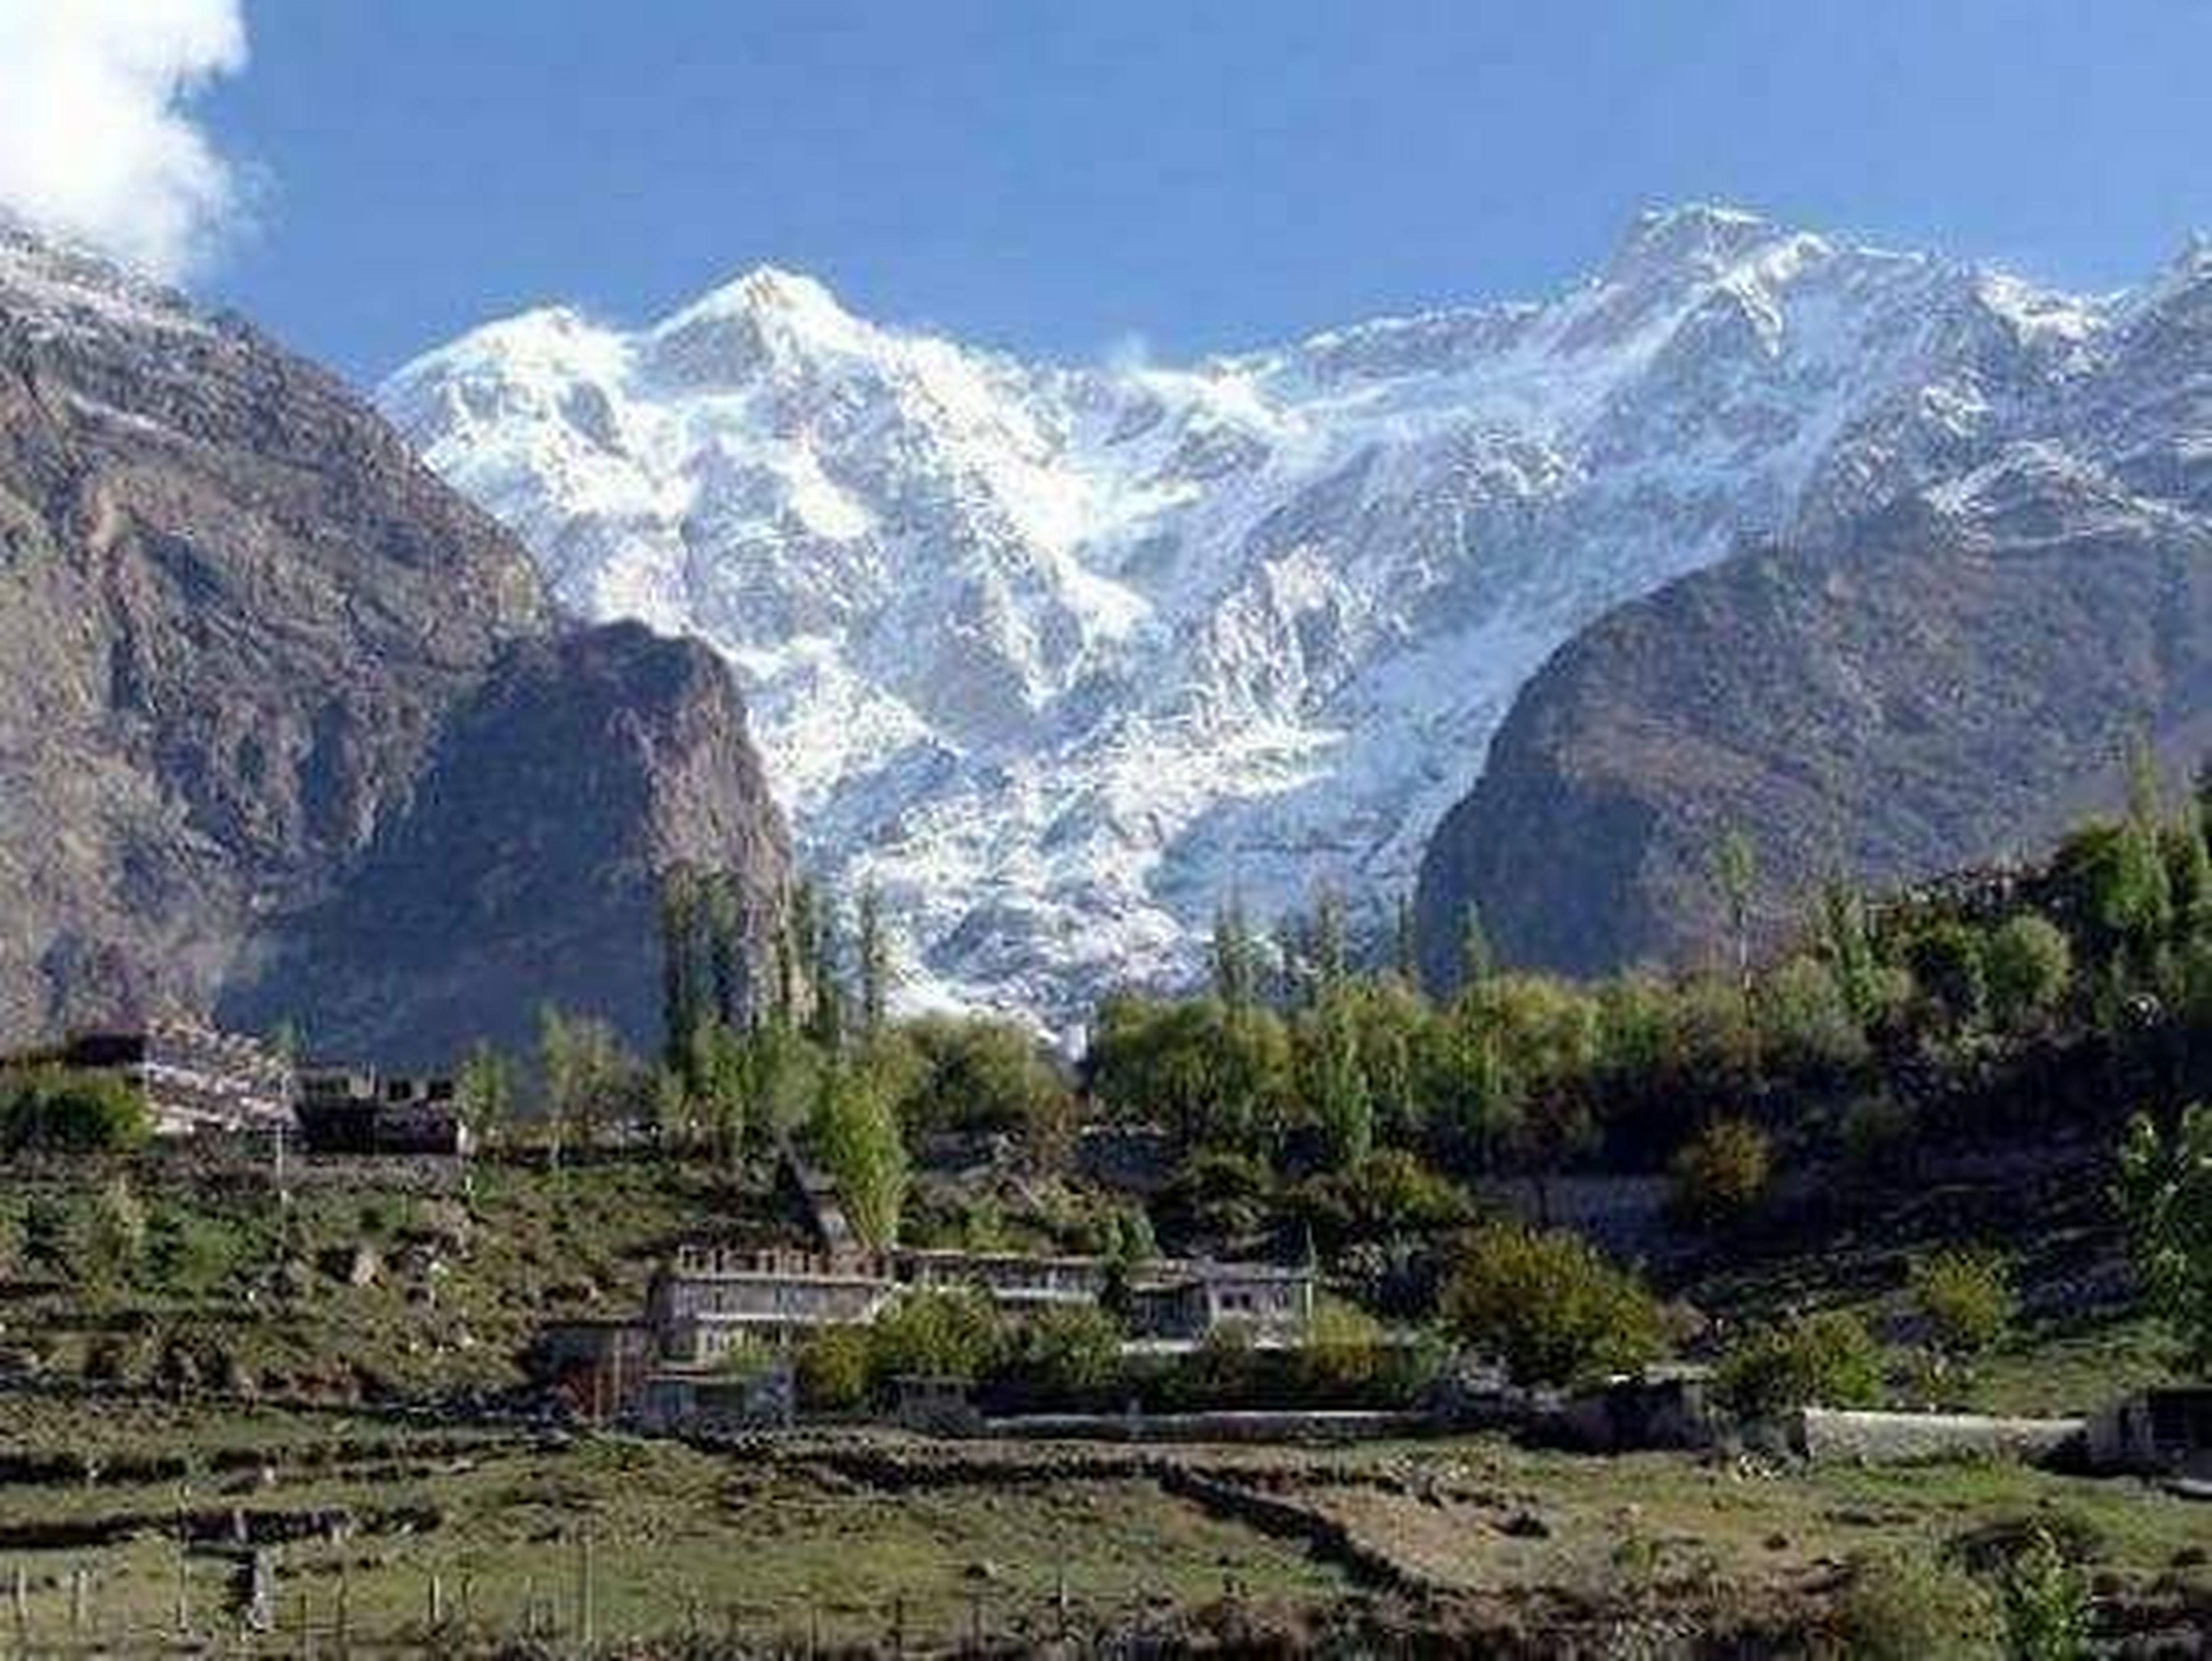 mountain, mountain range, mountain peak, landscape, snow, no people, scenics, outdoors, nature, tree, day, architecture, sky